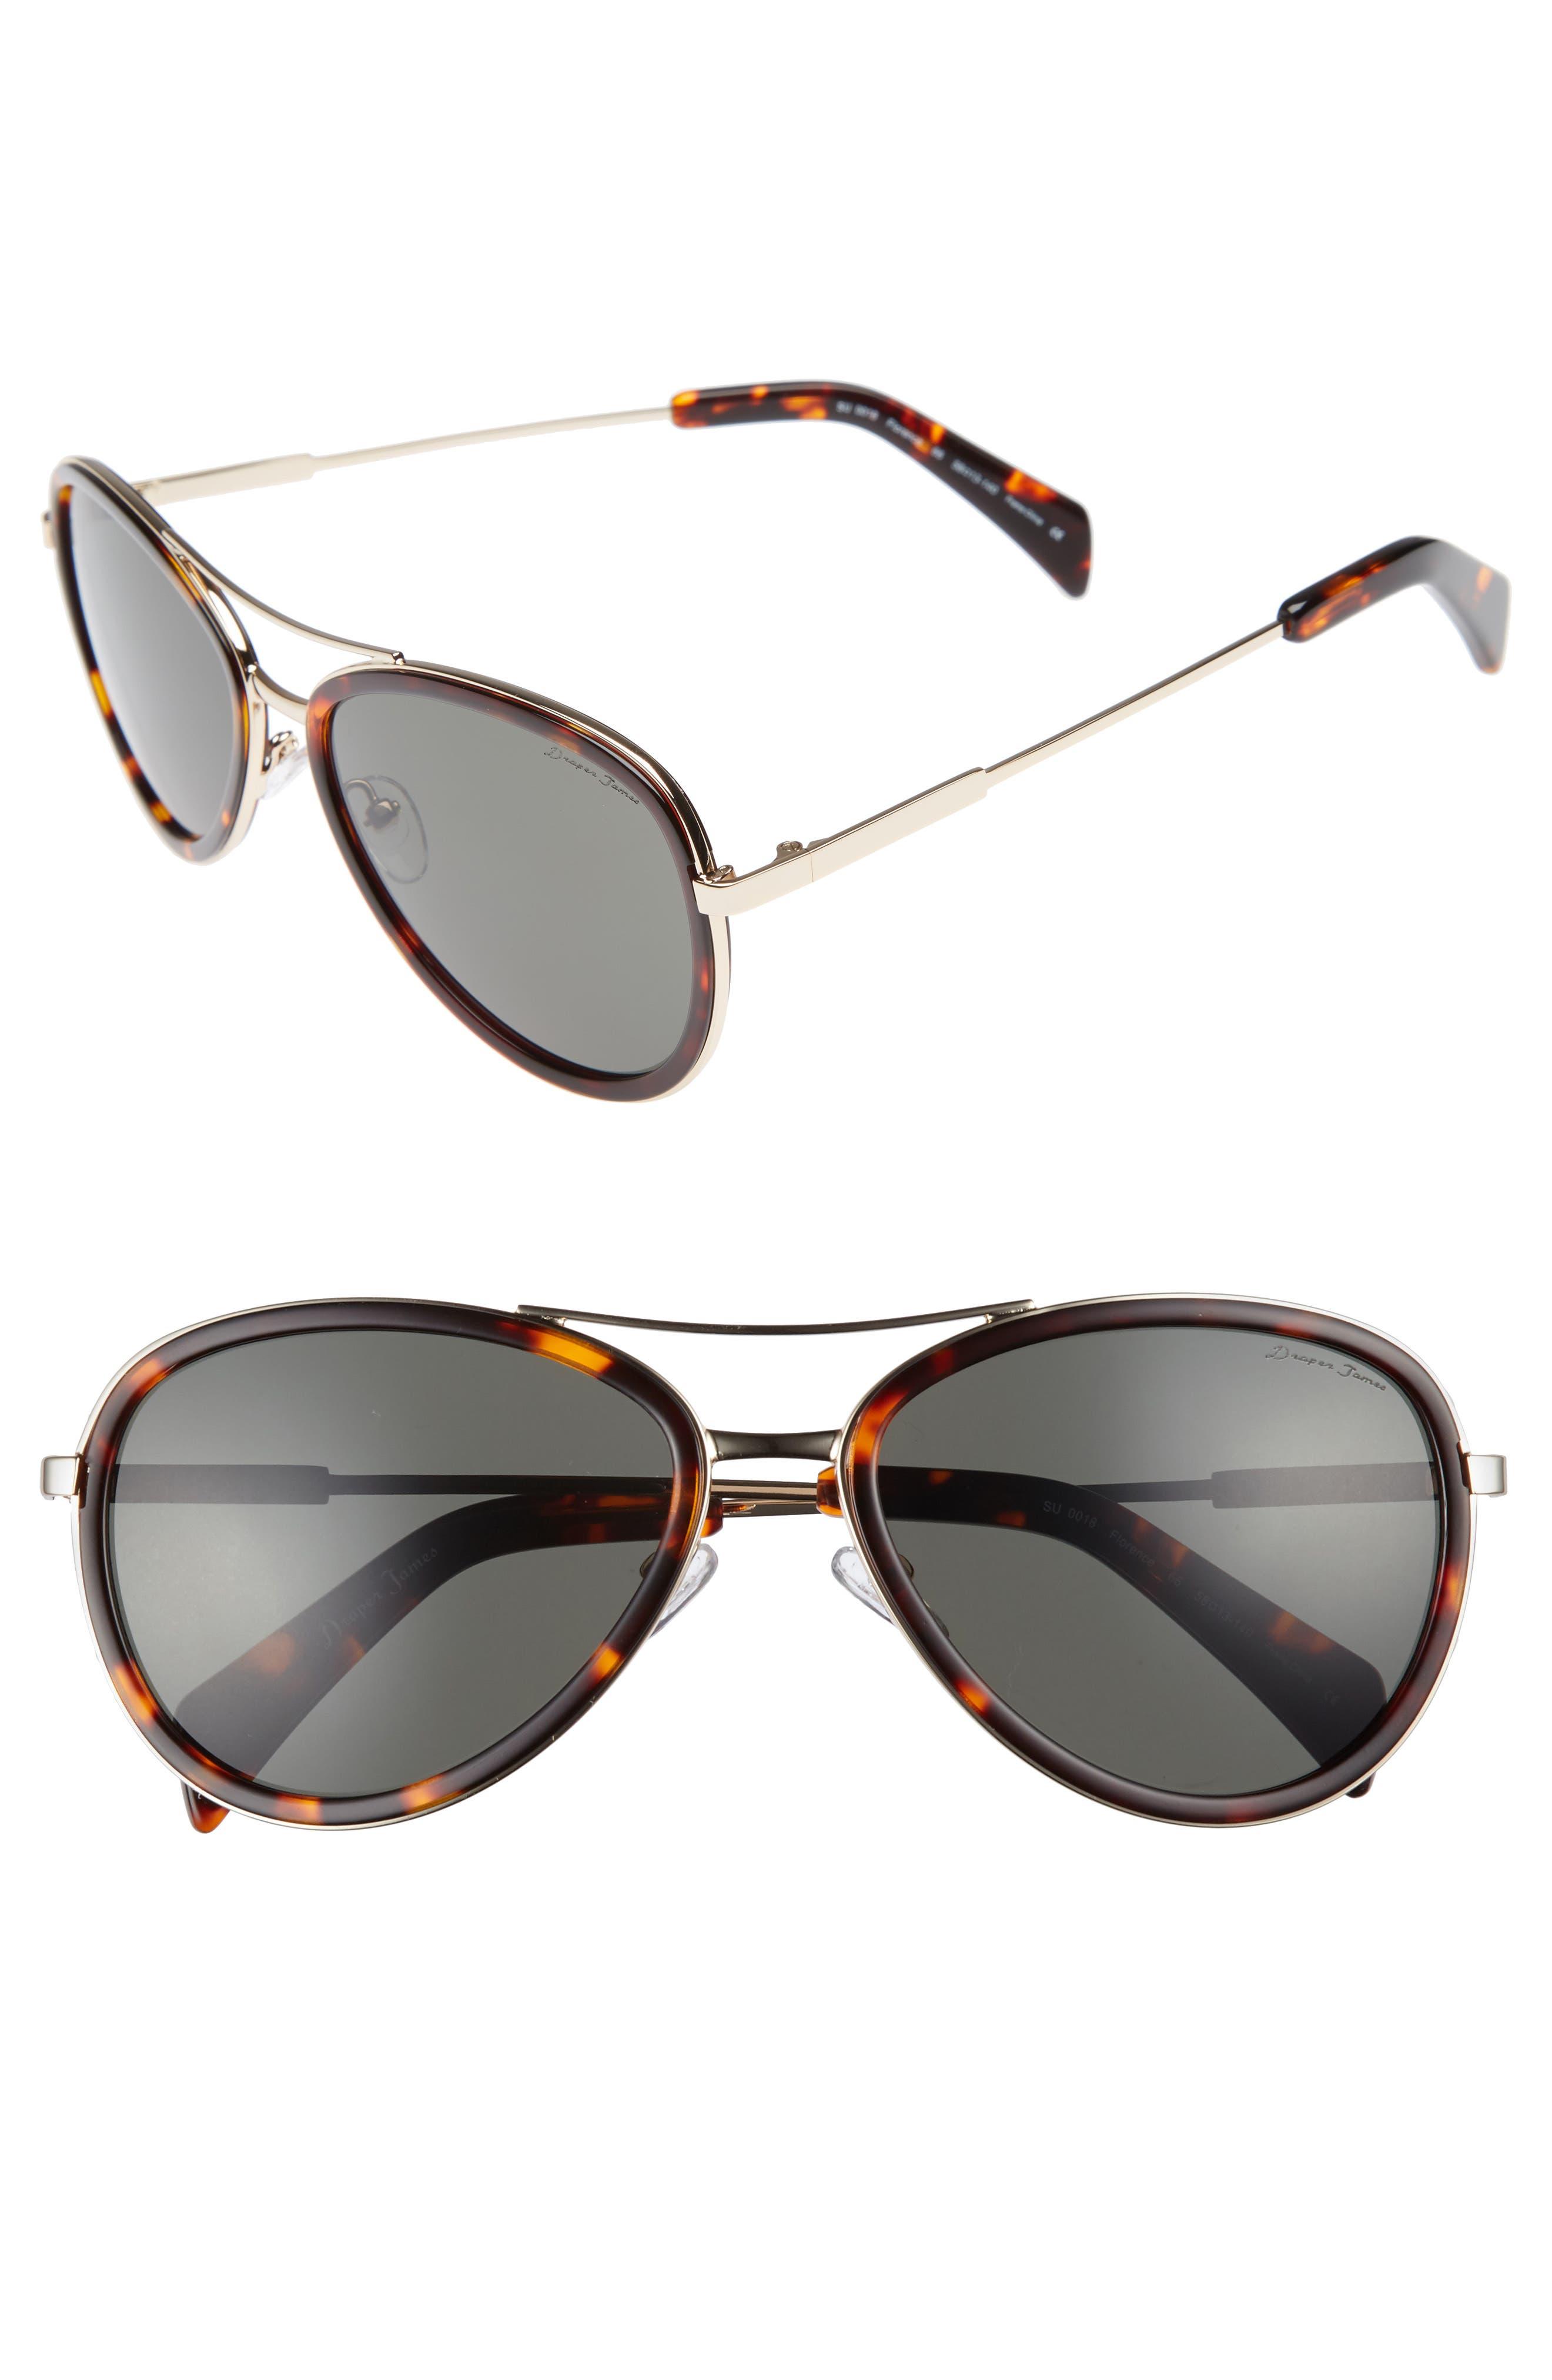 58mm Aviator Sunglasses,                             Main thumbnail 1, color,                             GOLD